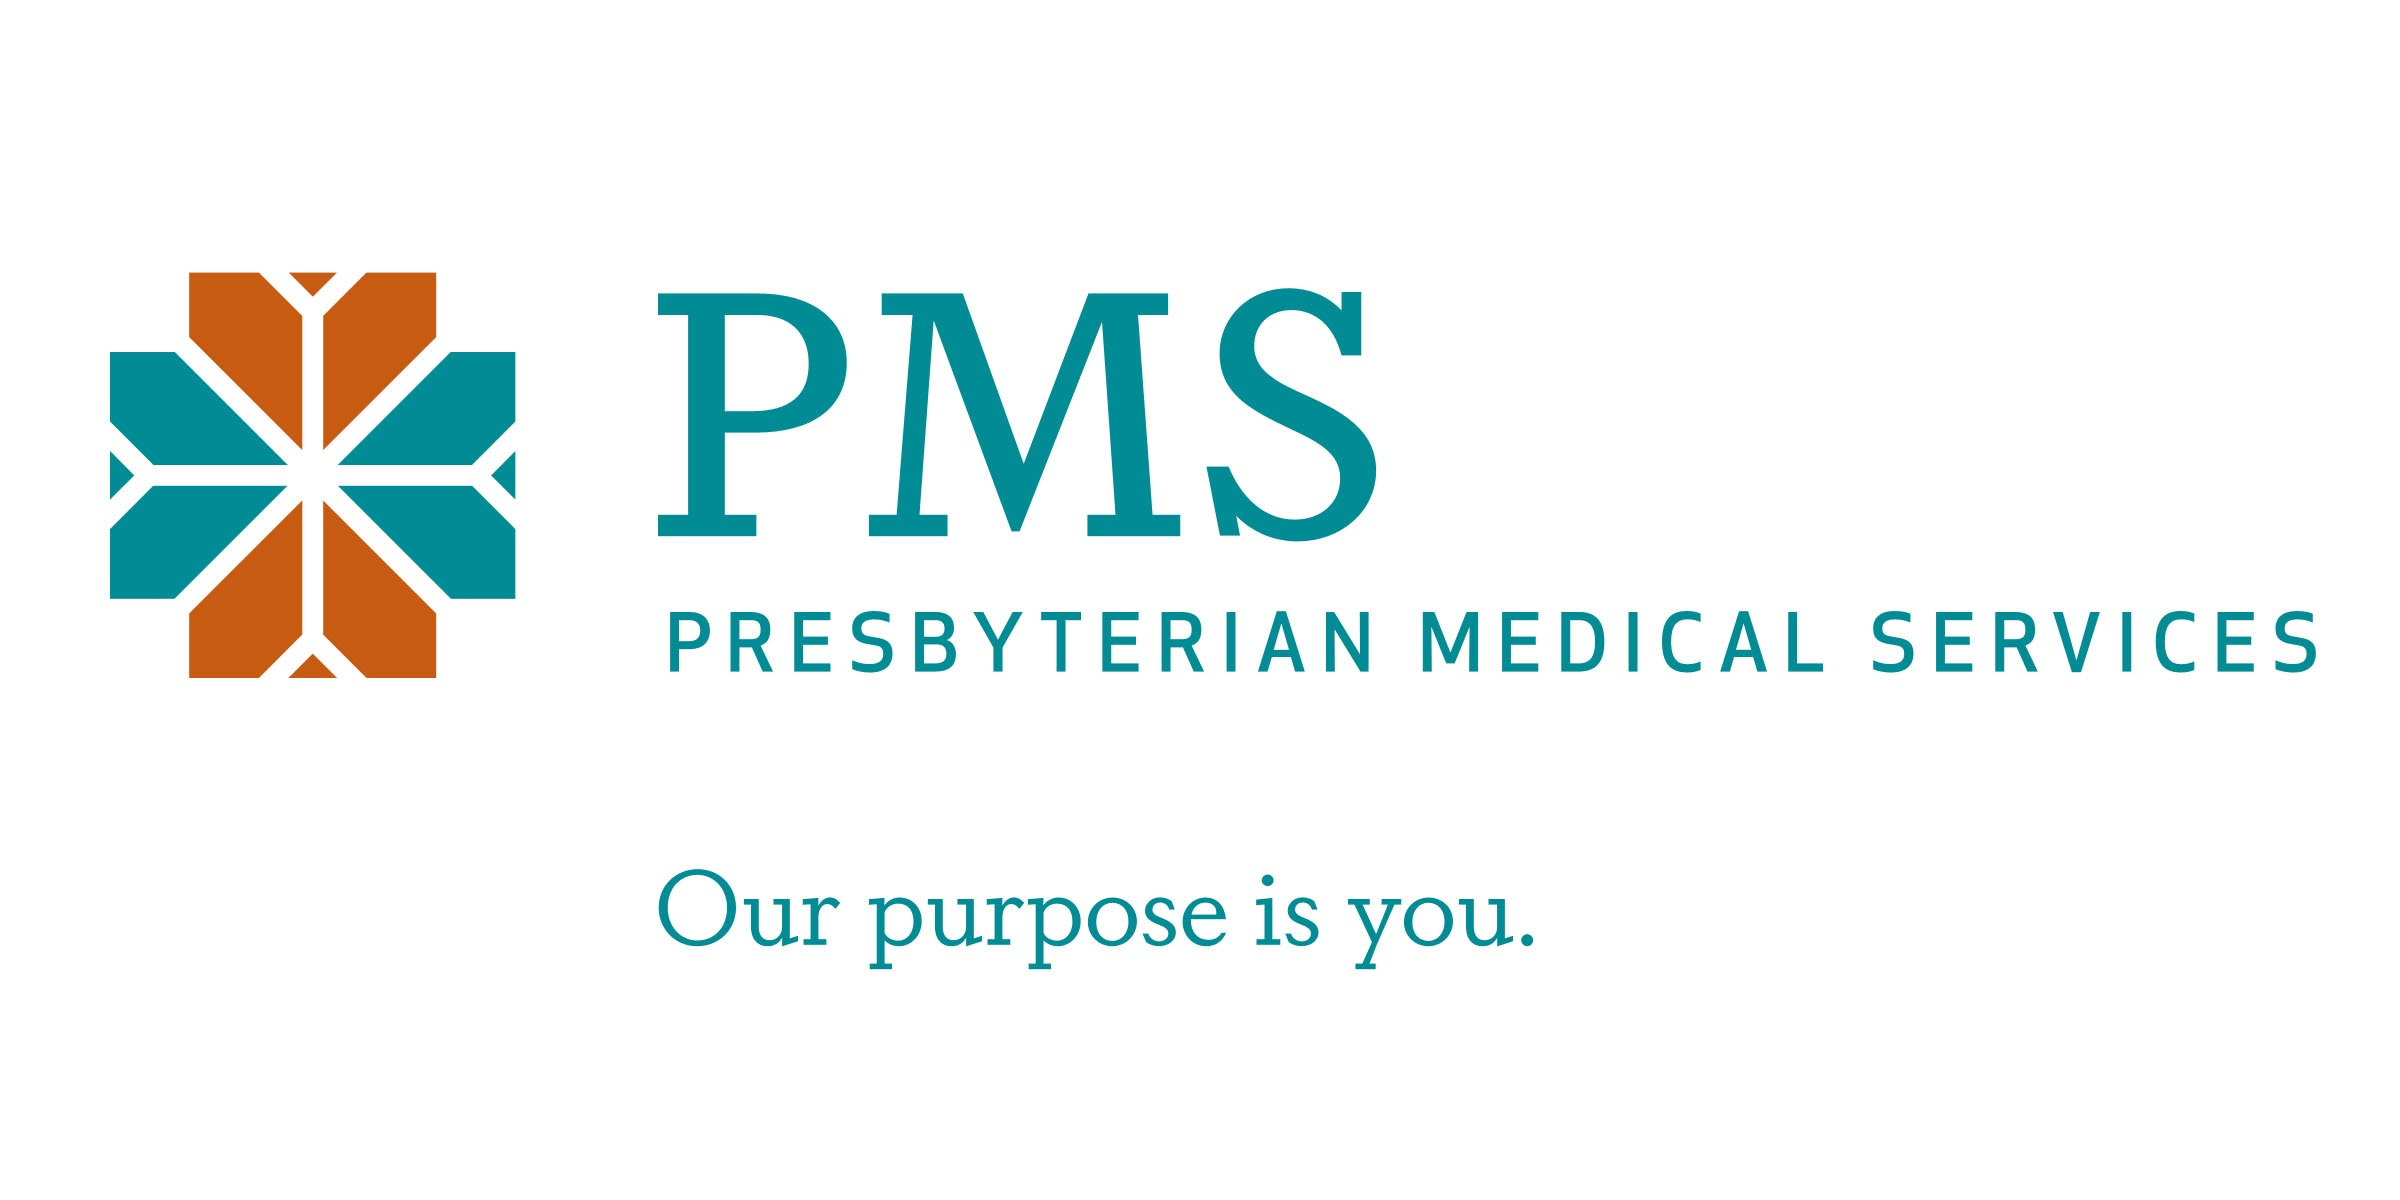 ADDICTION SERVICES DIRECTOR - Family Medicine or Psychiatrist - Presbyterian Medical Services - Santa Fe Community Guidance Center